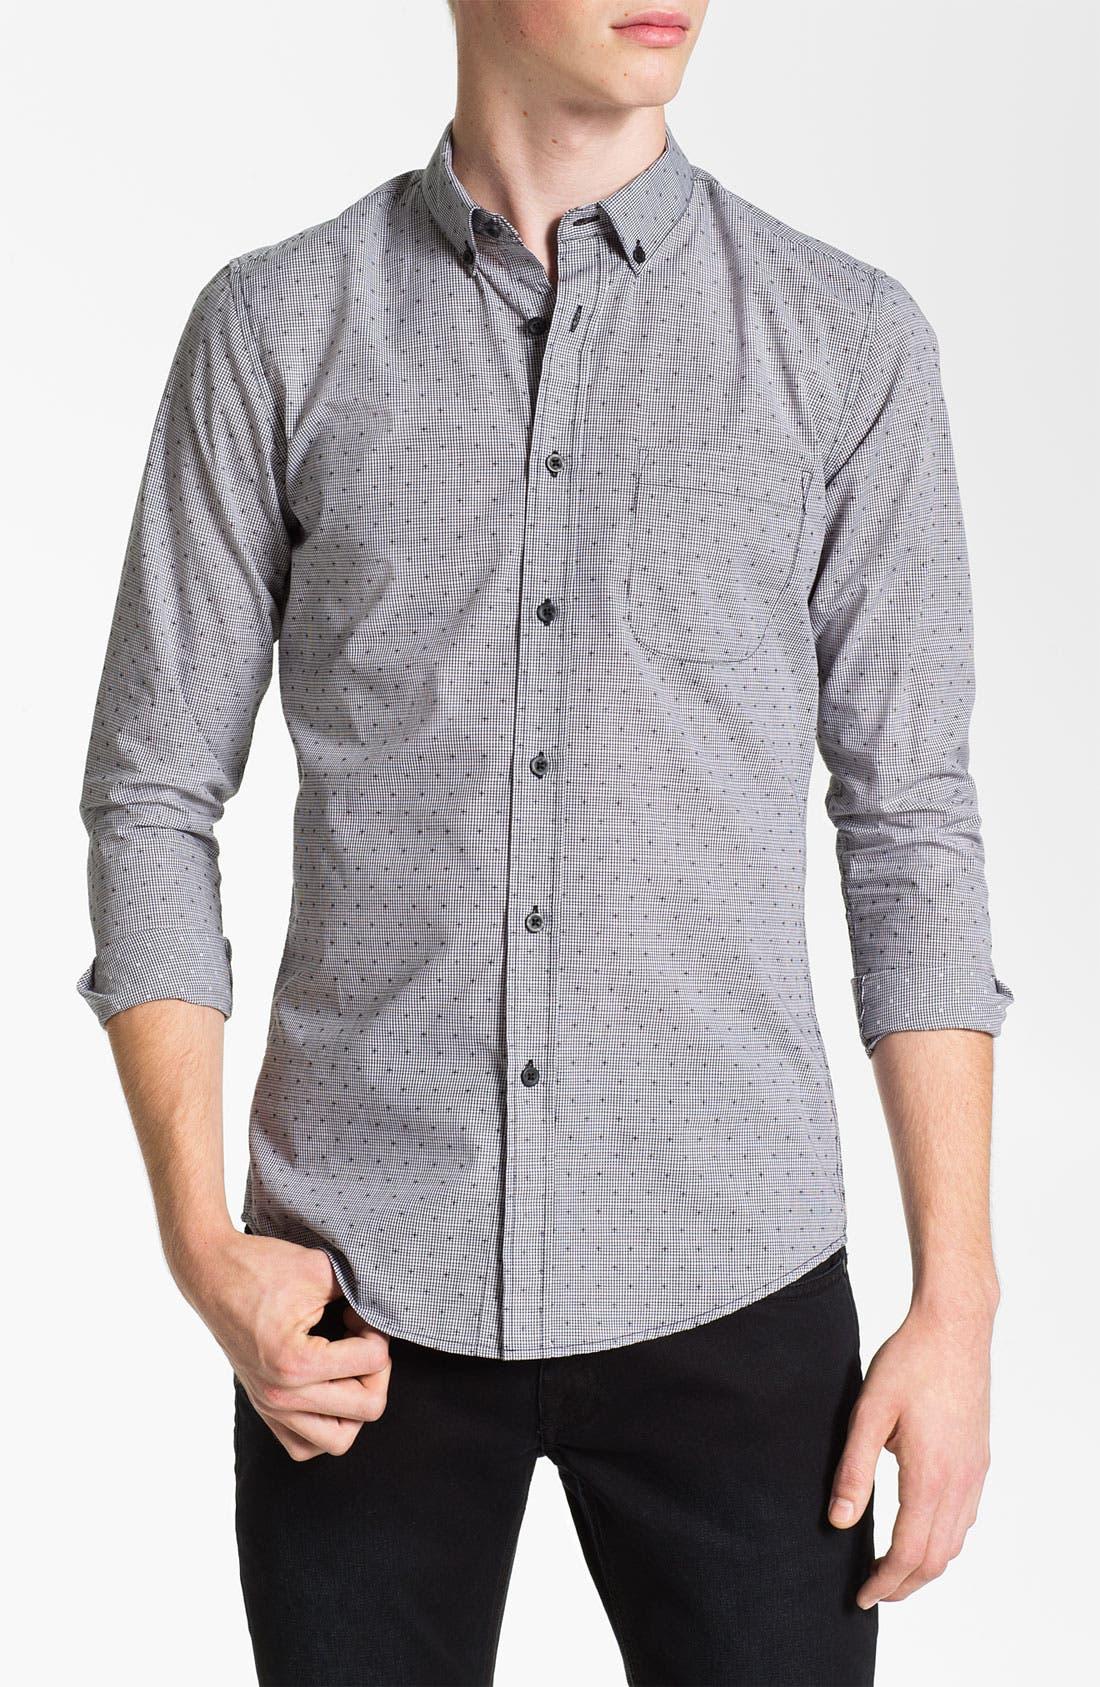 Alternate Image 1 Selected - Topman Extra Trim Grid Check Shirt